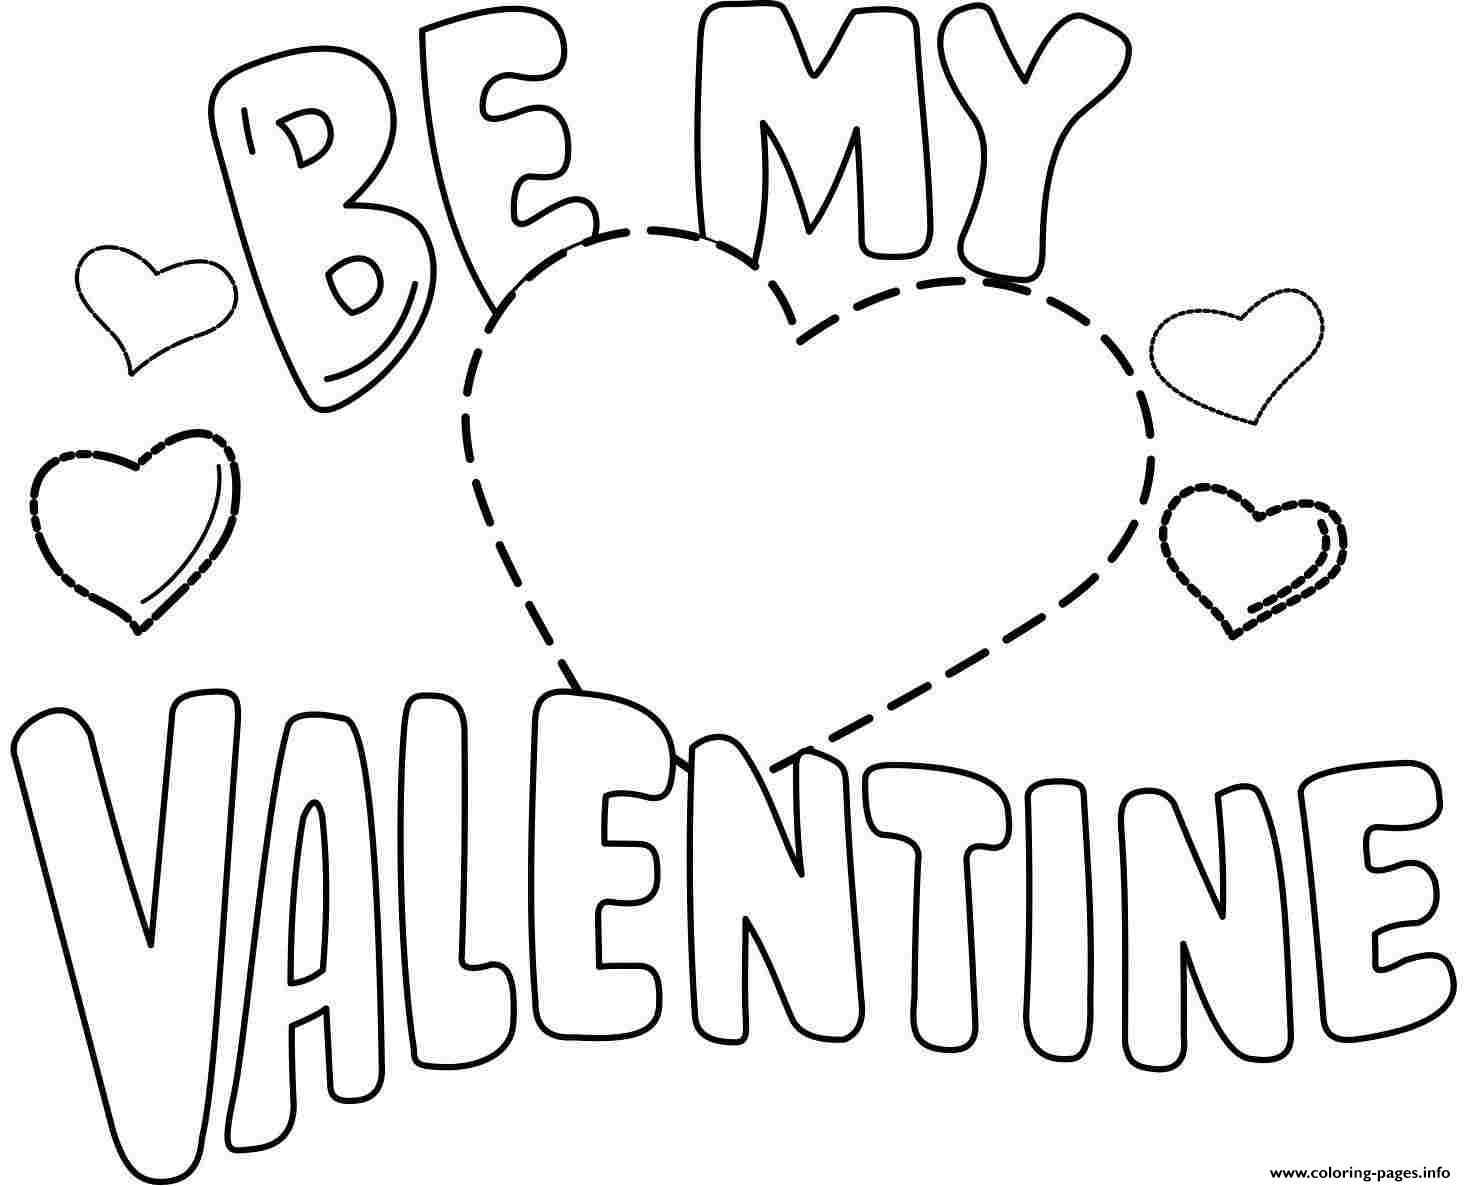 Coloring Book World: Printable Valentine Coloring Pages. Free - Free Printable Valentine Coloring Pages